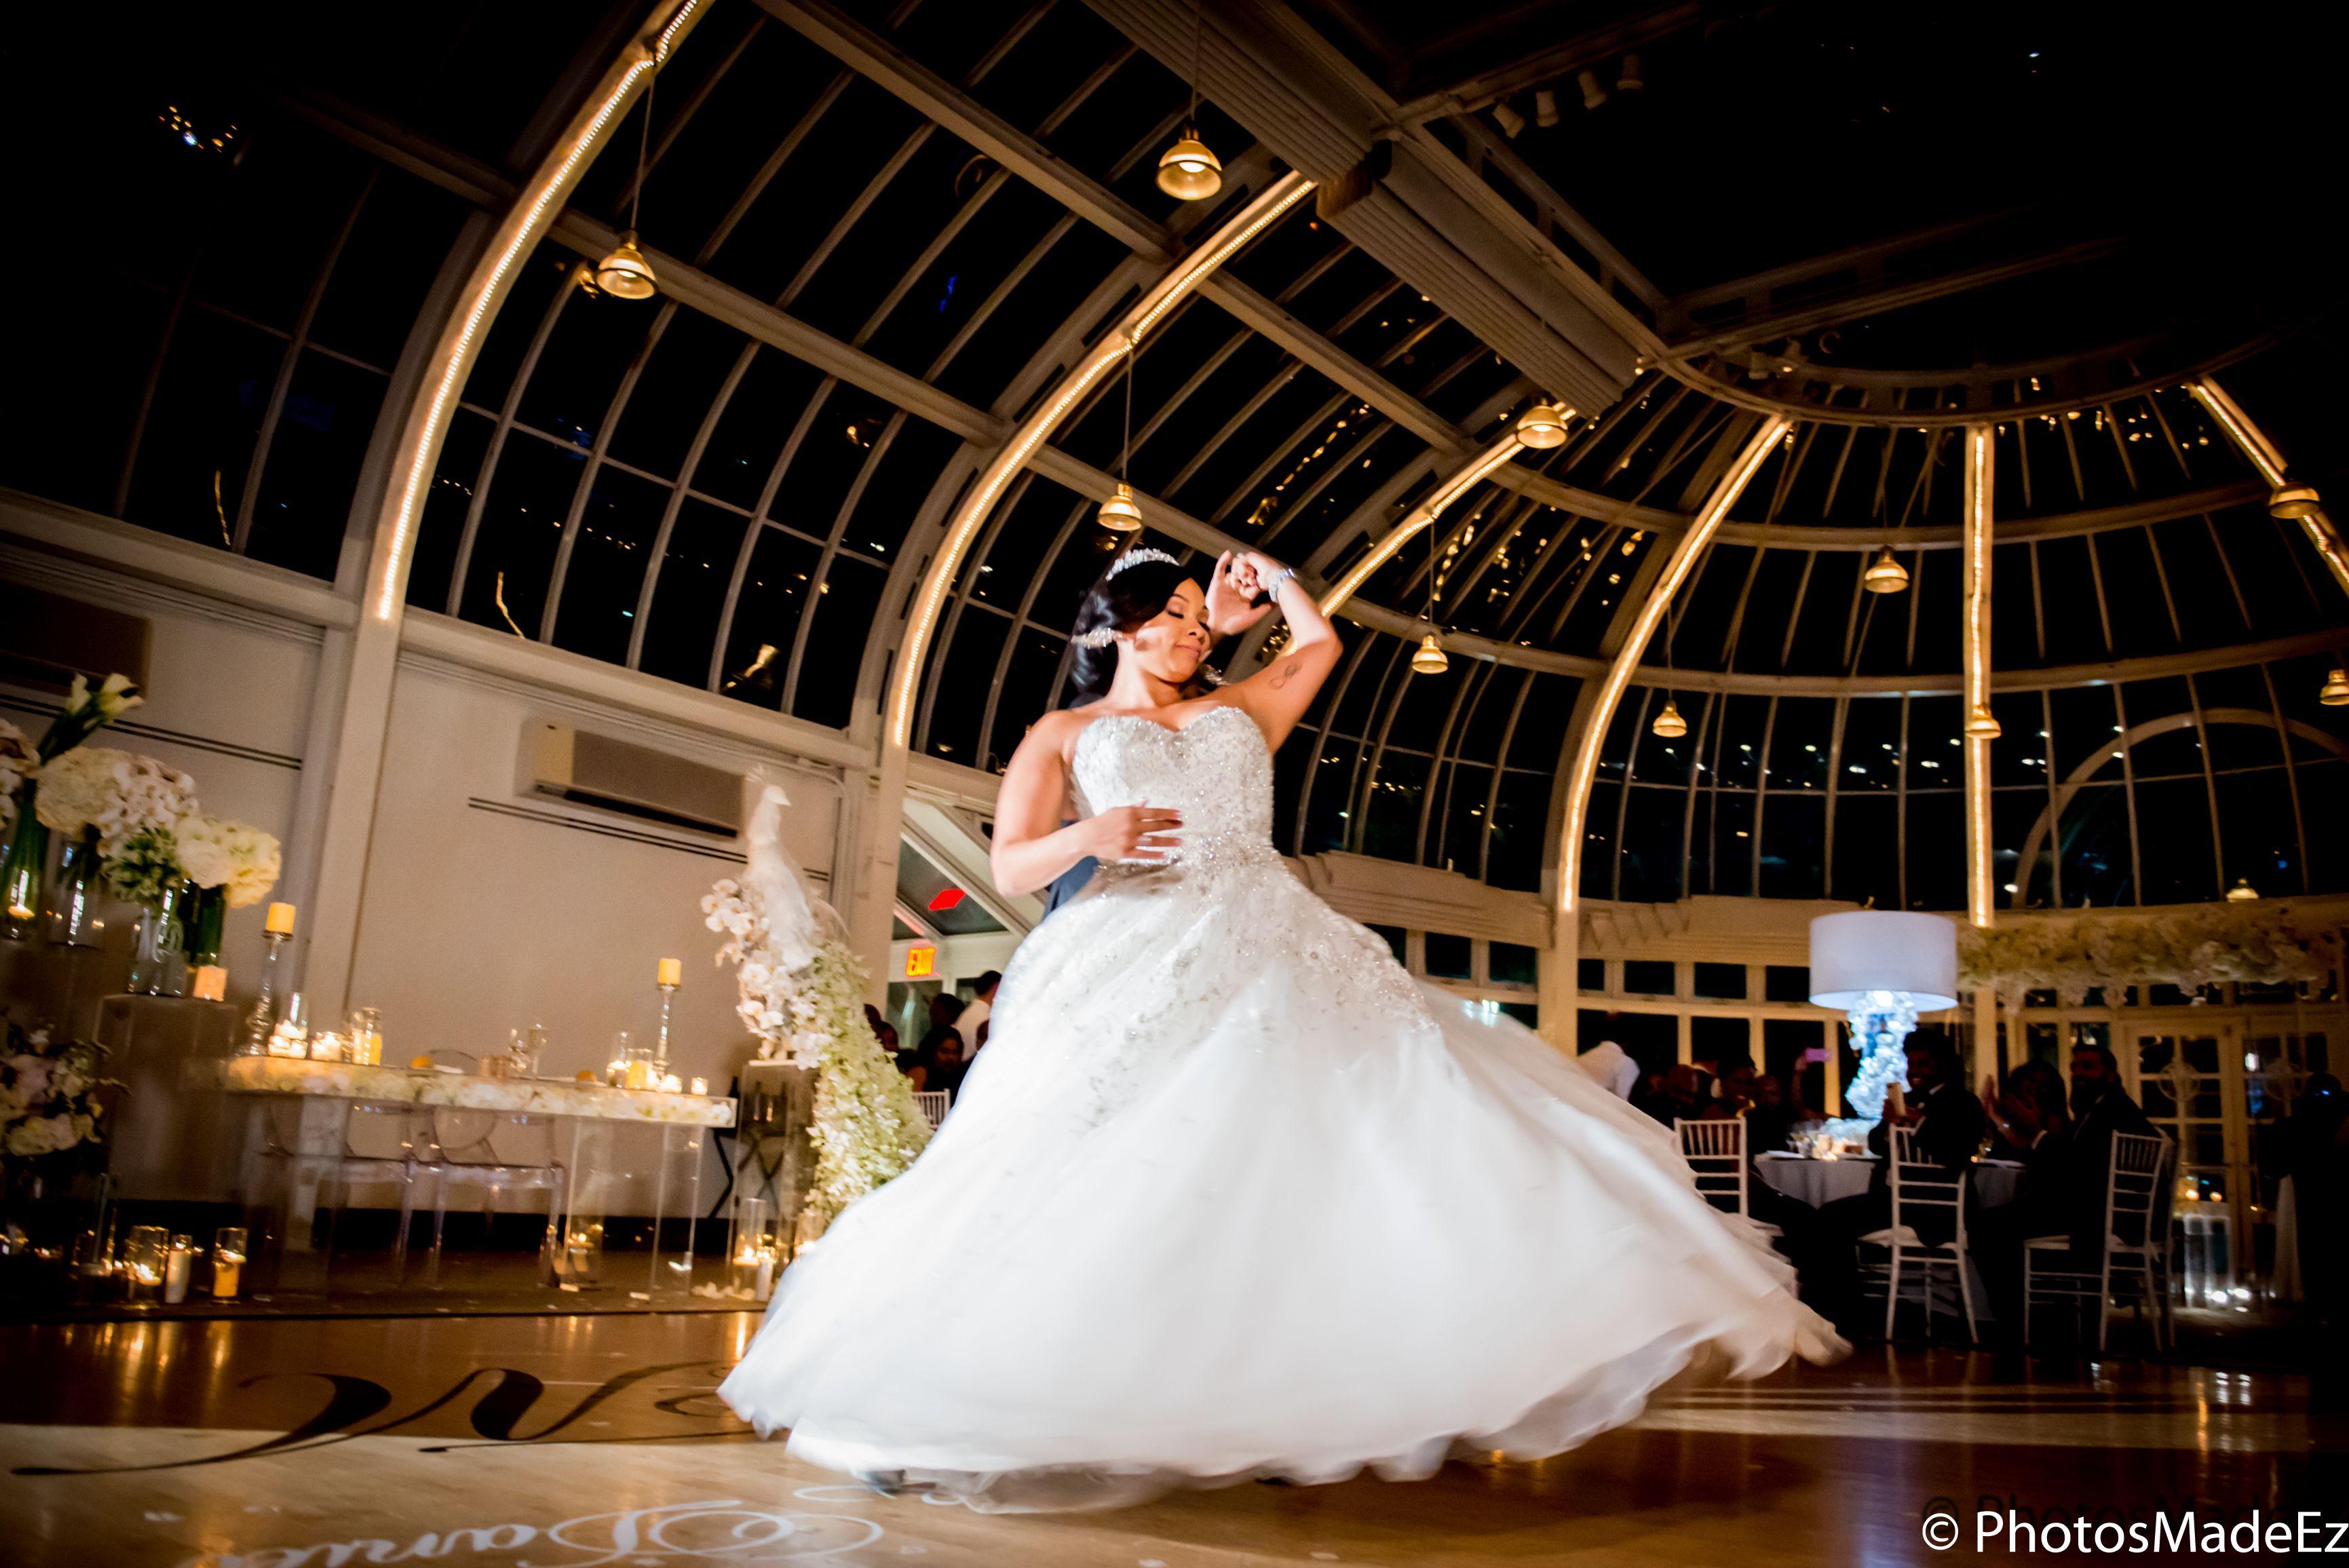 Natasha and Daniel - First Dance, Mixed Wedding at Brooklyn ...